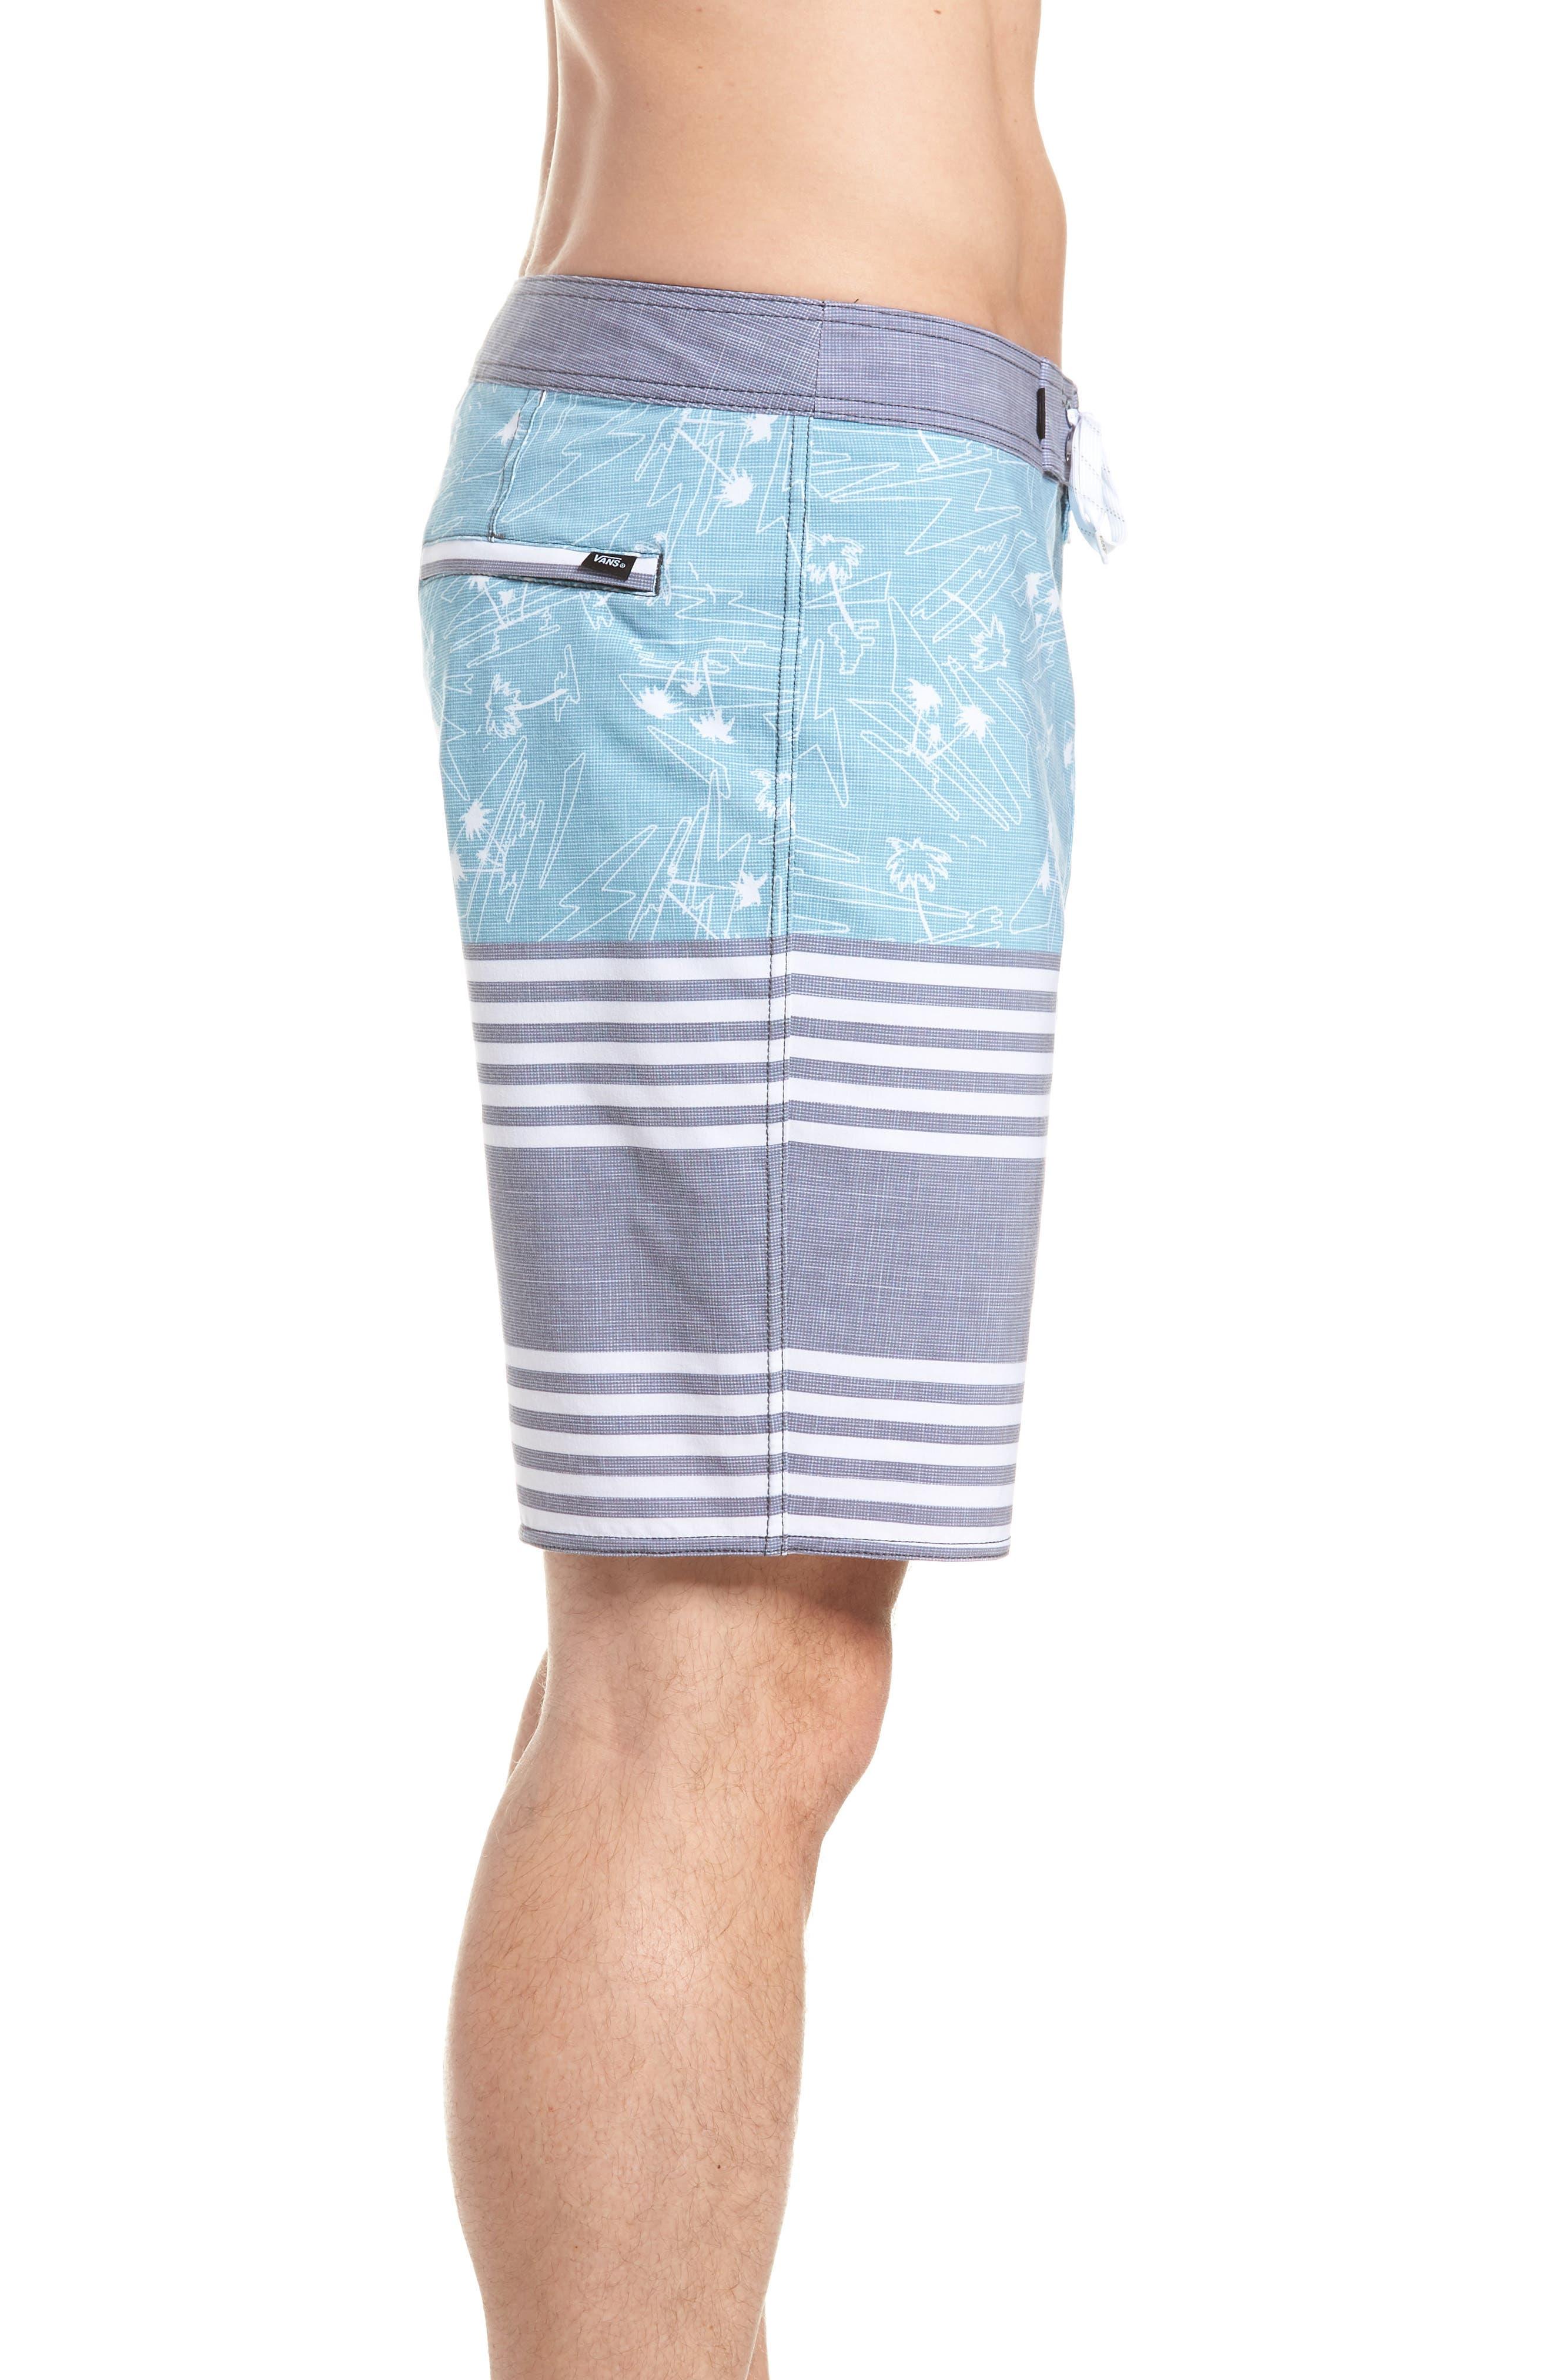 Era Board Shorts,                             Alternate thumbnail 3, color,                             DRESS BLUES ISLAND BEACH